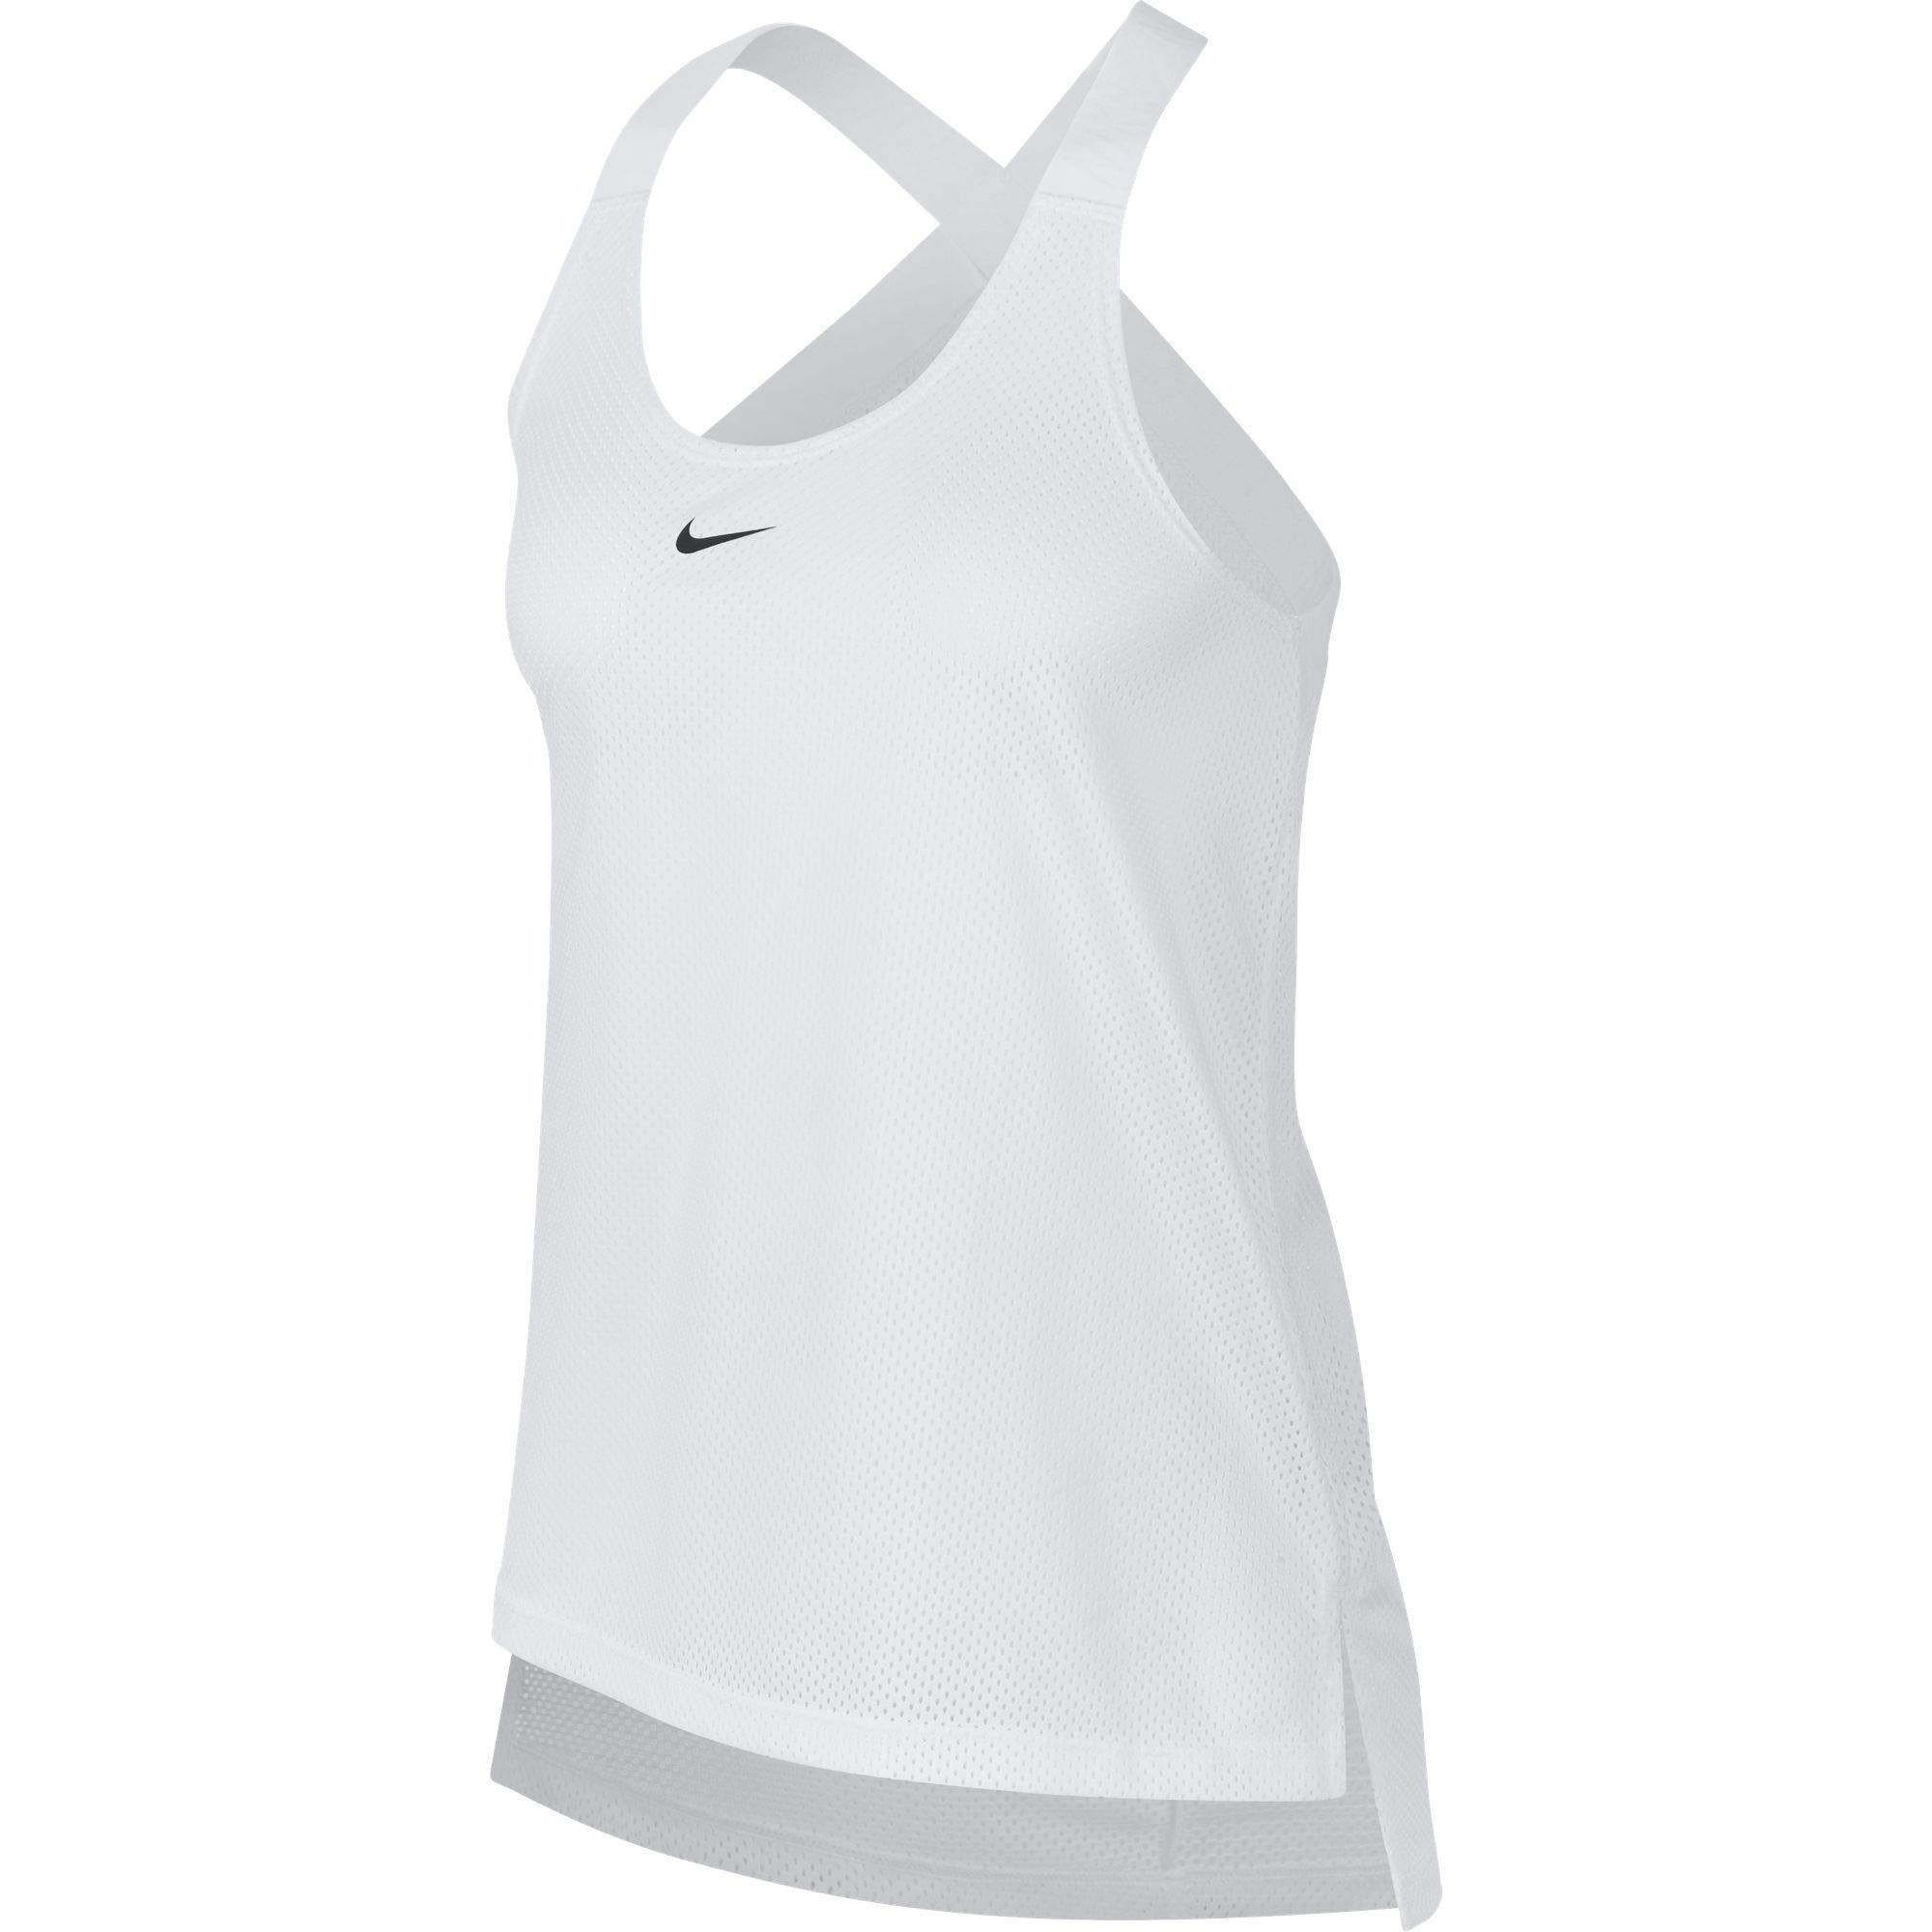 4036eb5c83844 Nike Elastika Camiseta sin Mangas Cuello Redondo Sin Mangas Poliéster -  Camisas y Camisetas (Camiseta sin Mangas